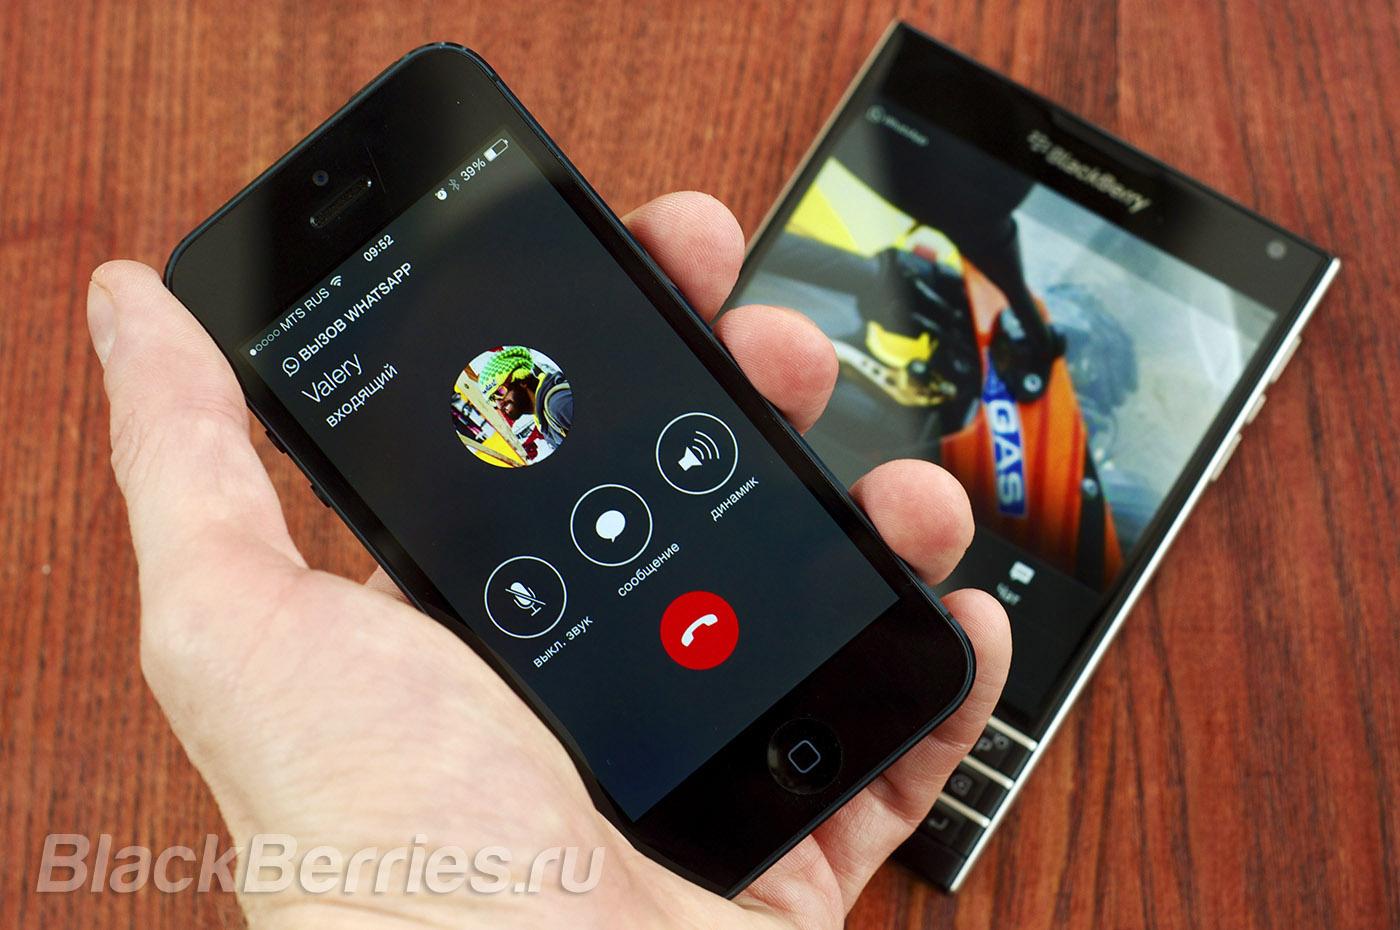 BlackBerry-iPhone-WhatsApp